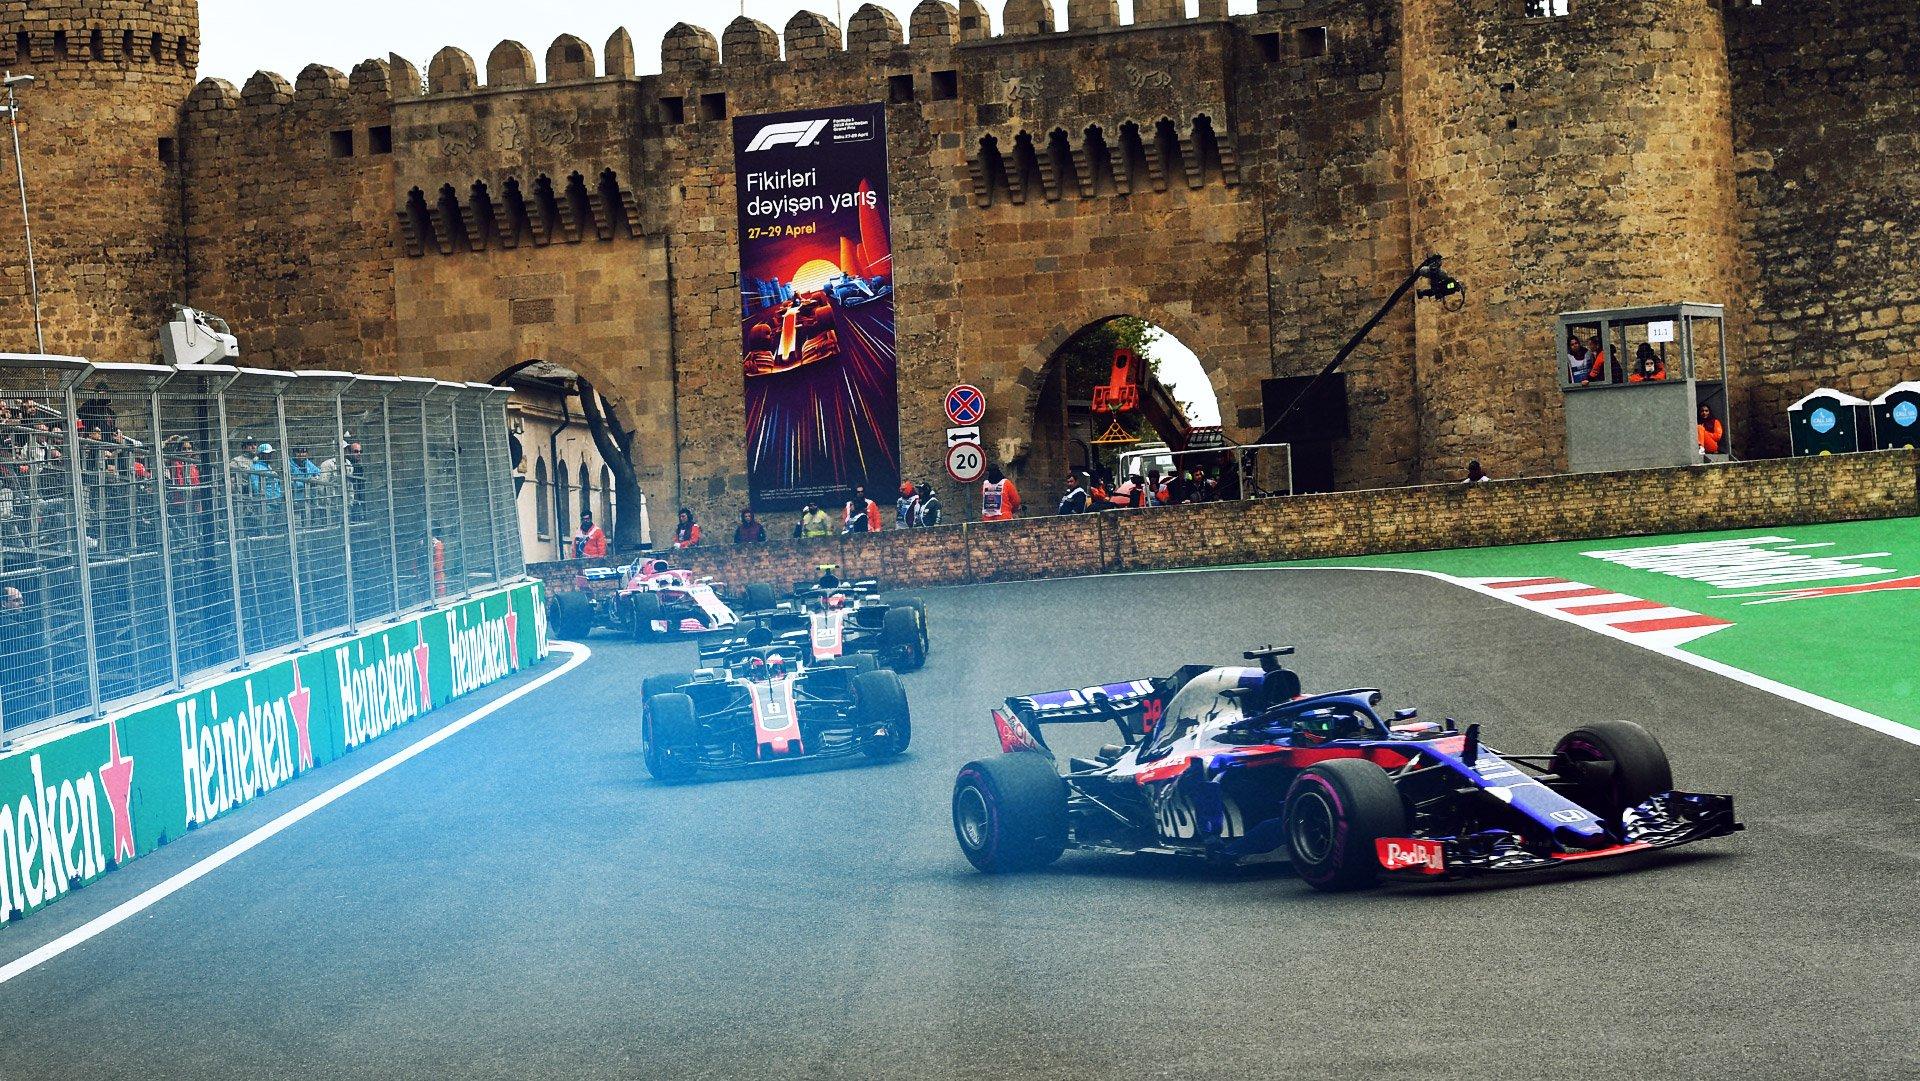 F1 Schedule 2019 – Official Calendar Of Grand Prix Races Formula 1 Calendar 2019 Download